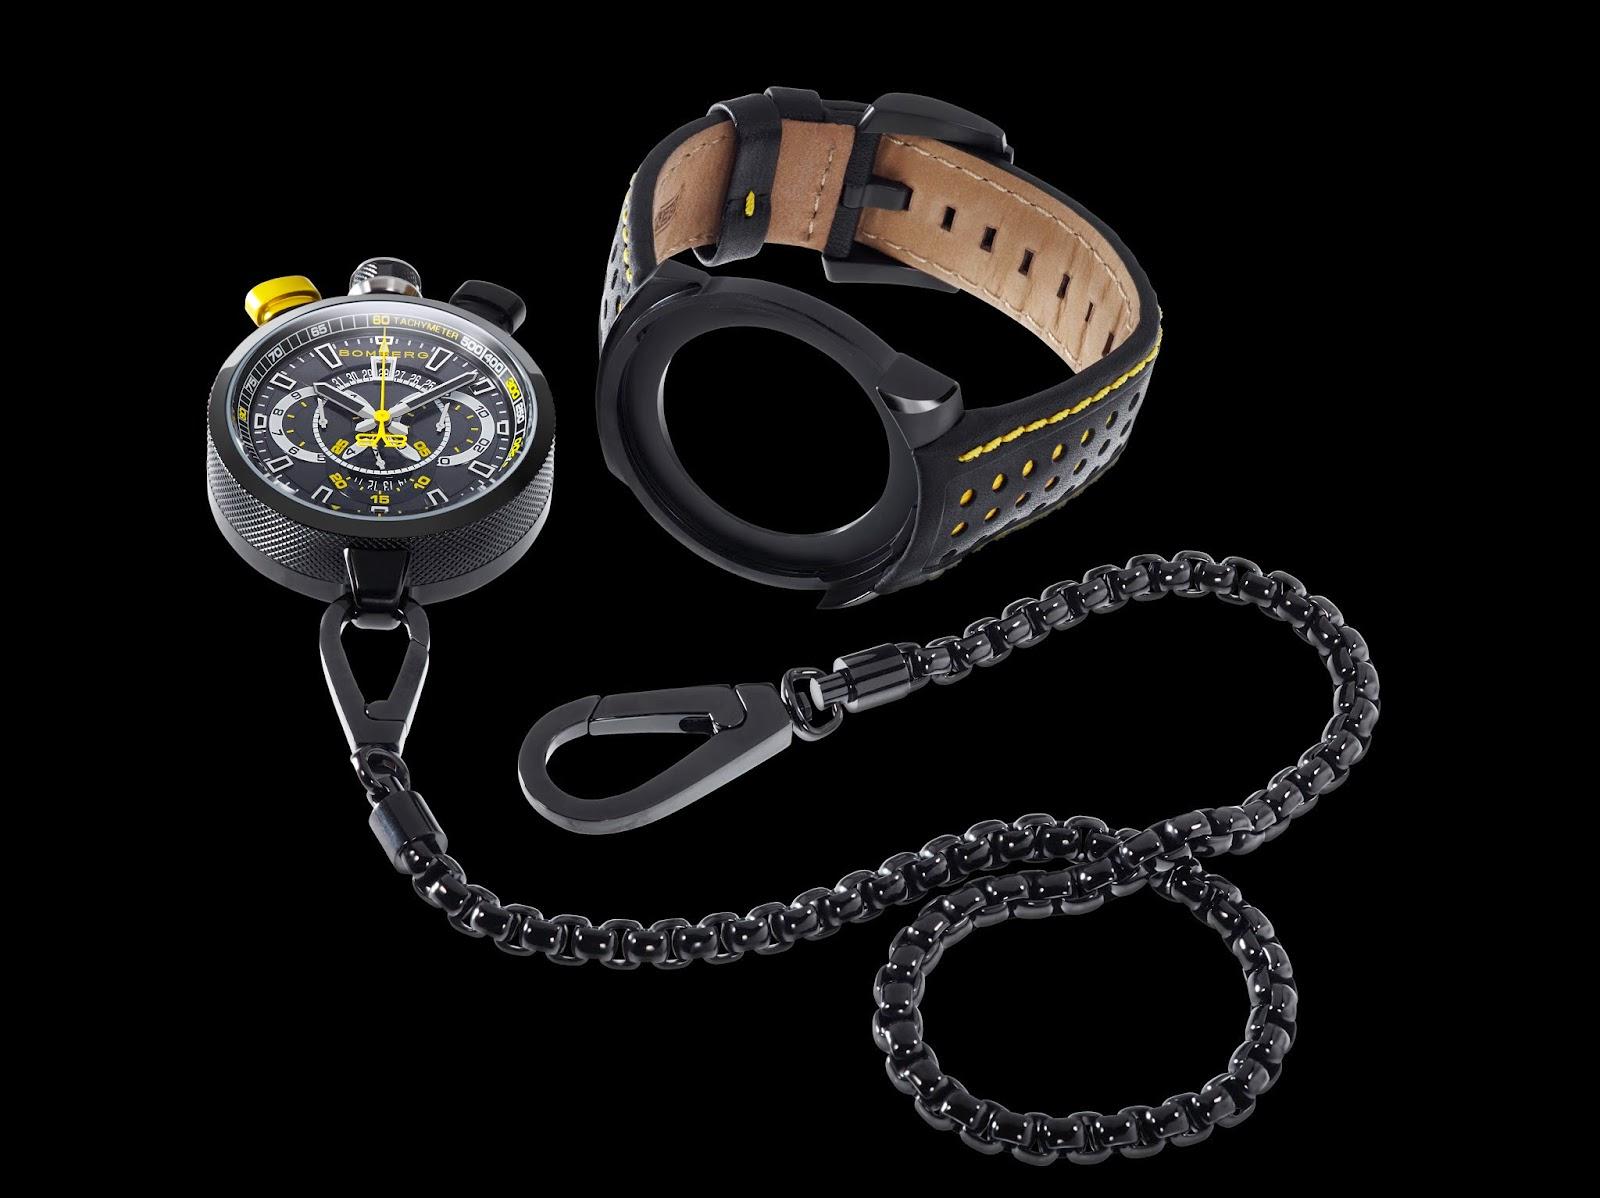 bomberg_reloj_compra